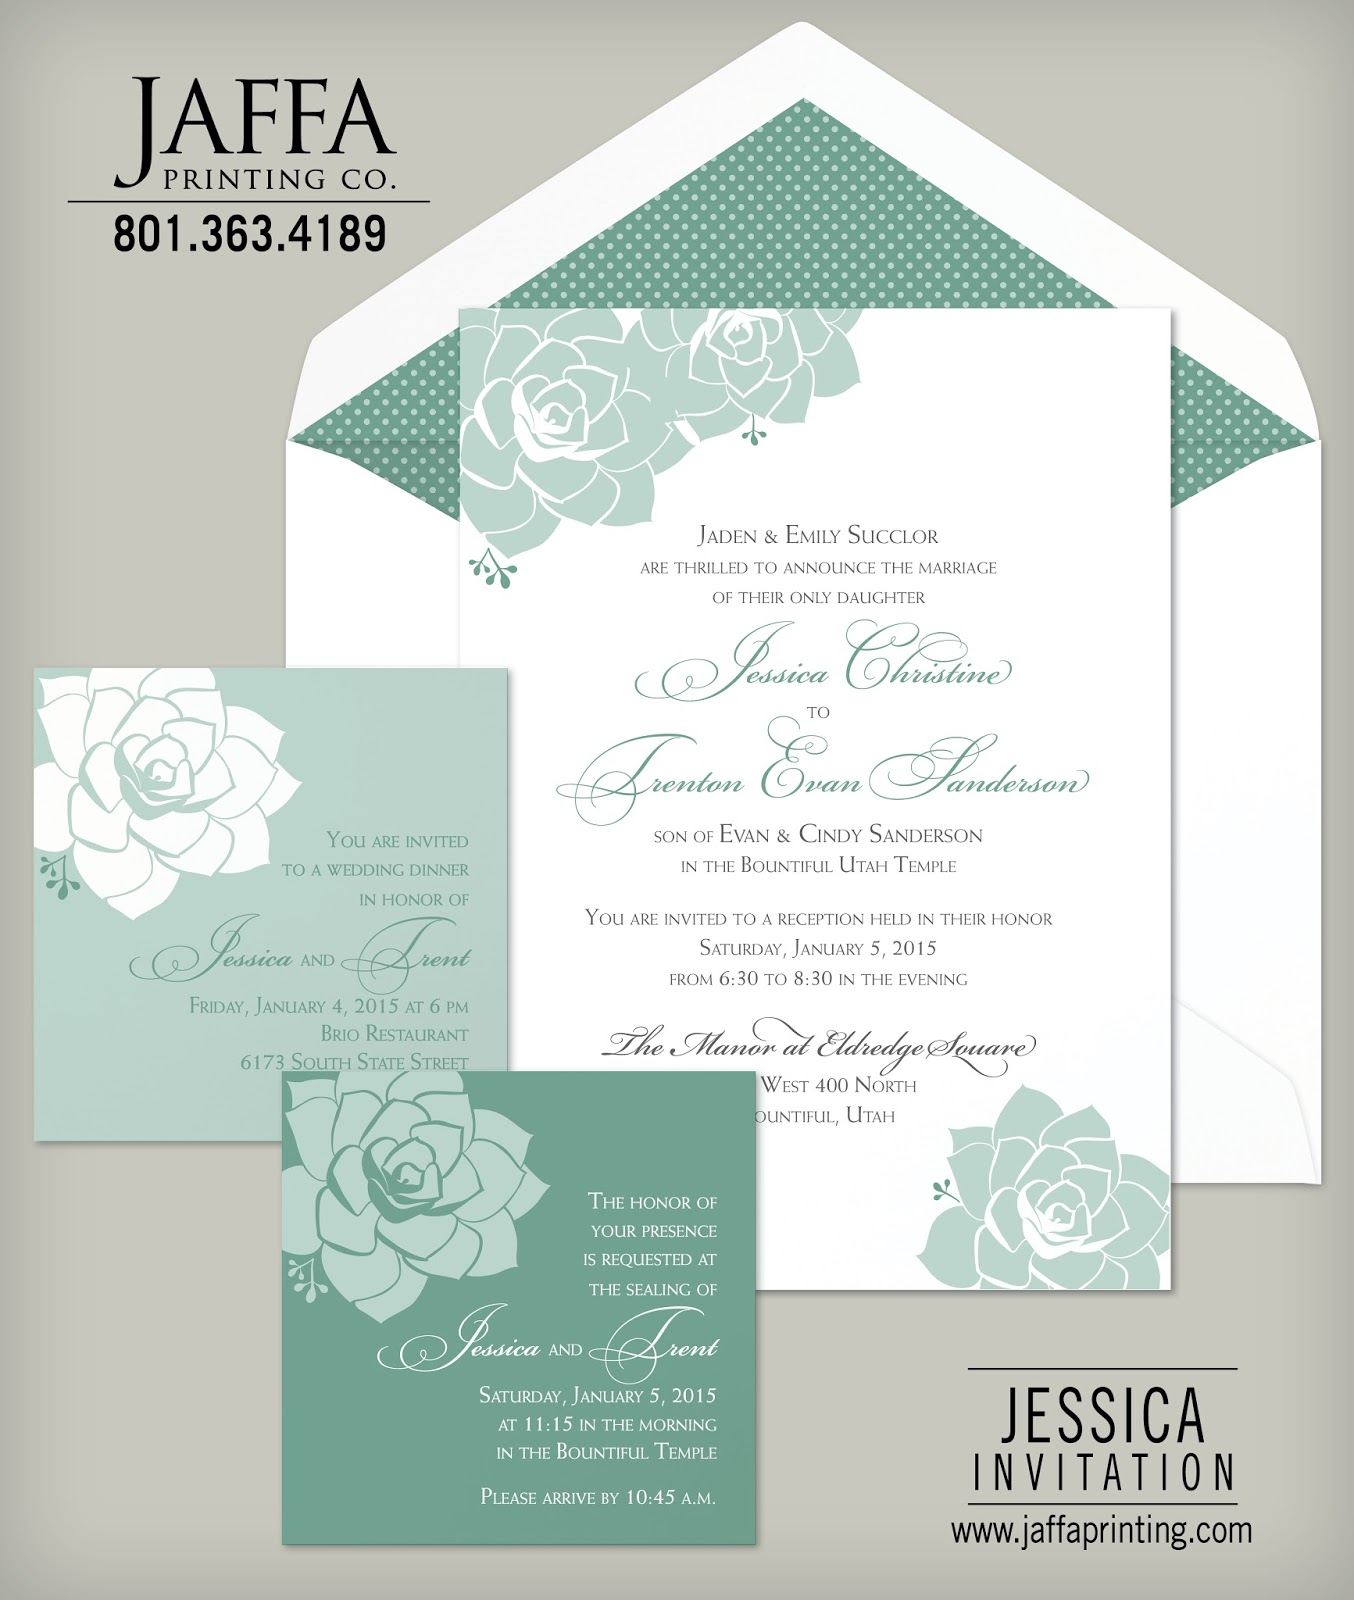 Wedding Invitation Blog Floral Succulents The Jessica Wedding